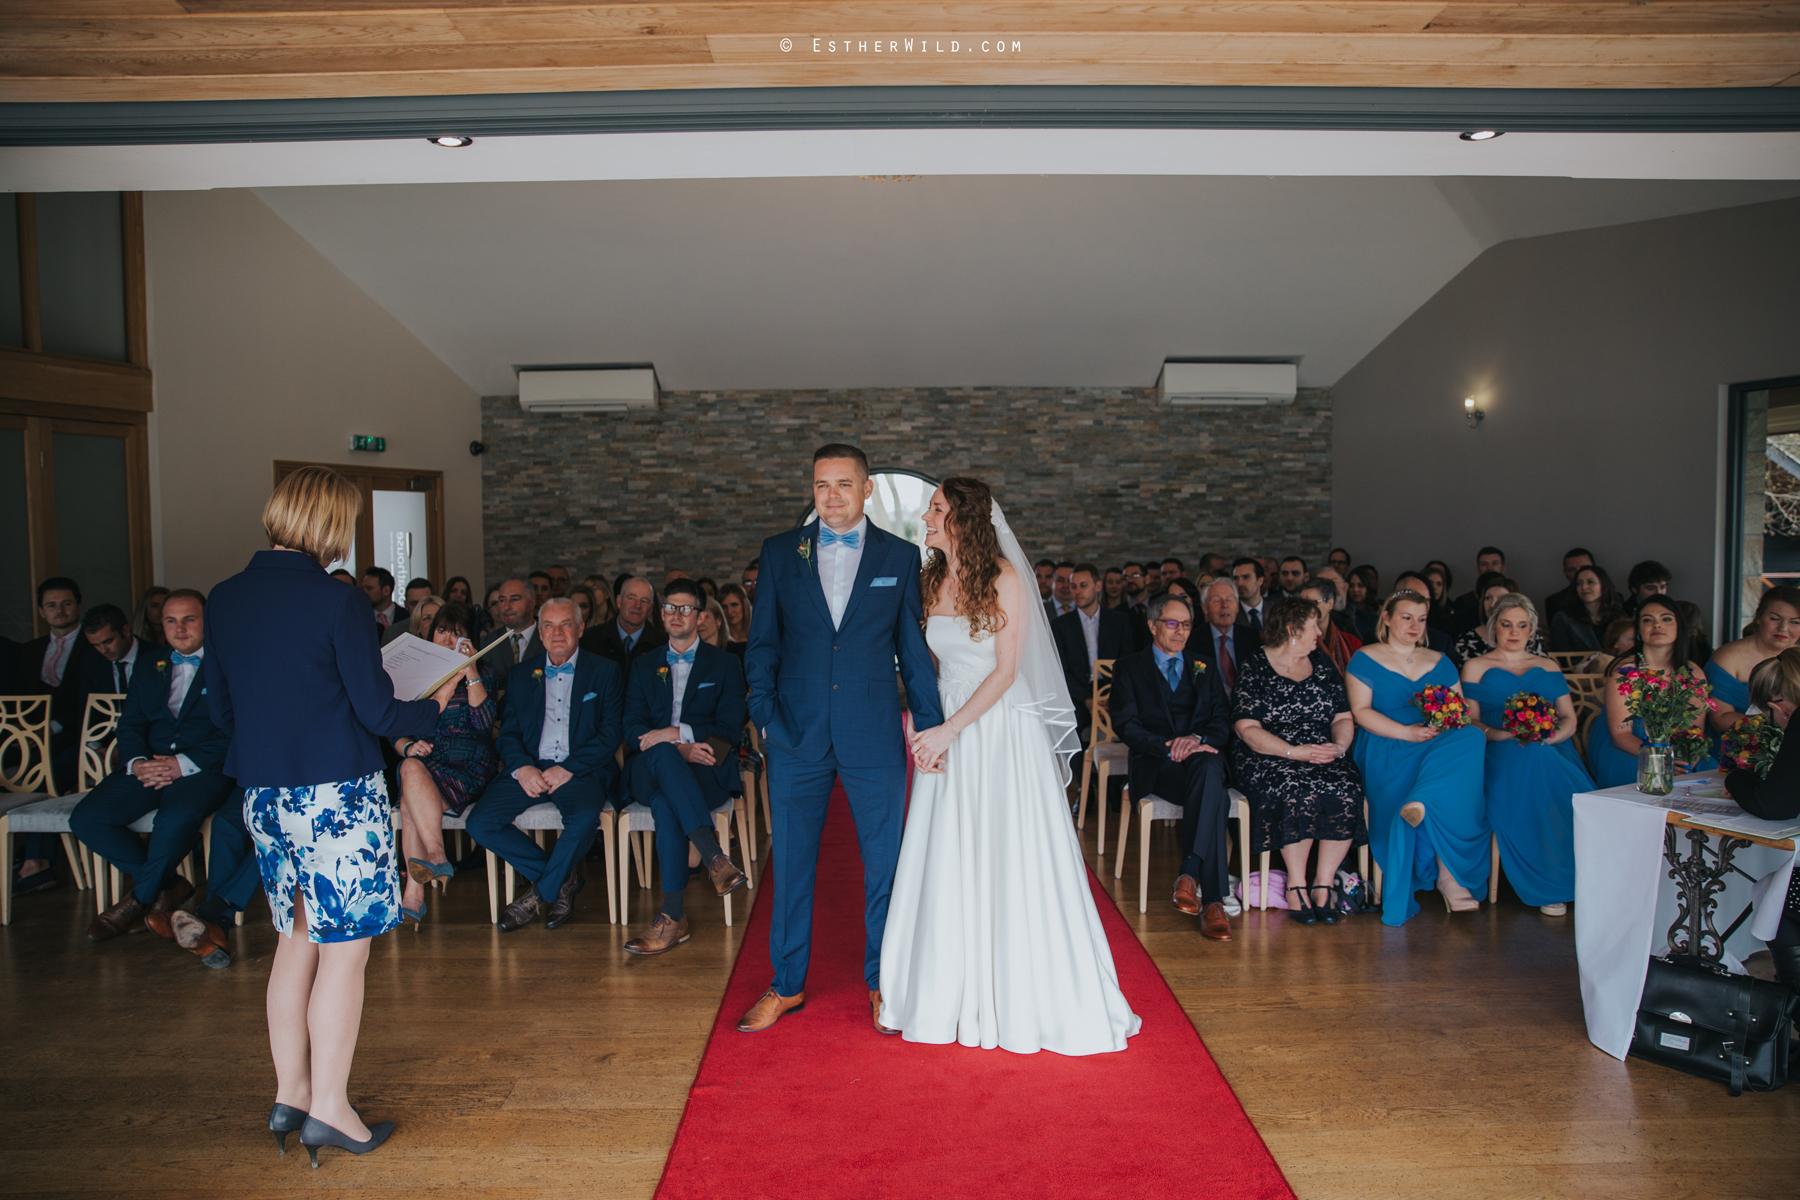 The_BoatHouse_Wedding_Venue_Ormesby_Norfolk_Broads_Boat_Wedding_Photography_Esther_Wild_Photographer_IMG_1109.jpg